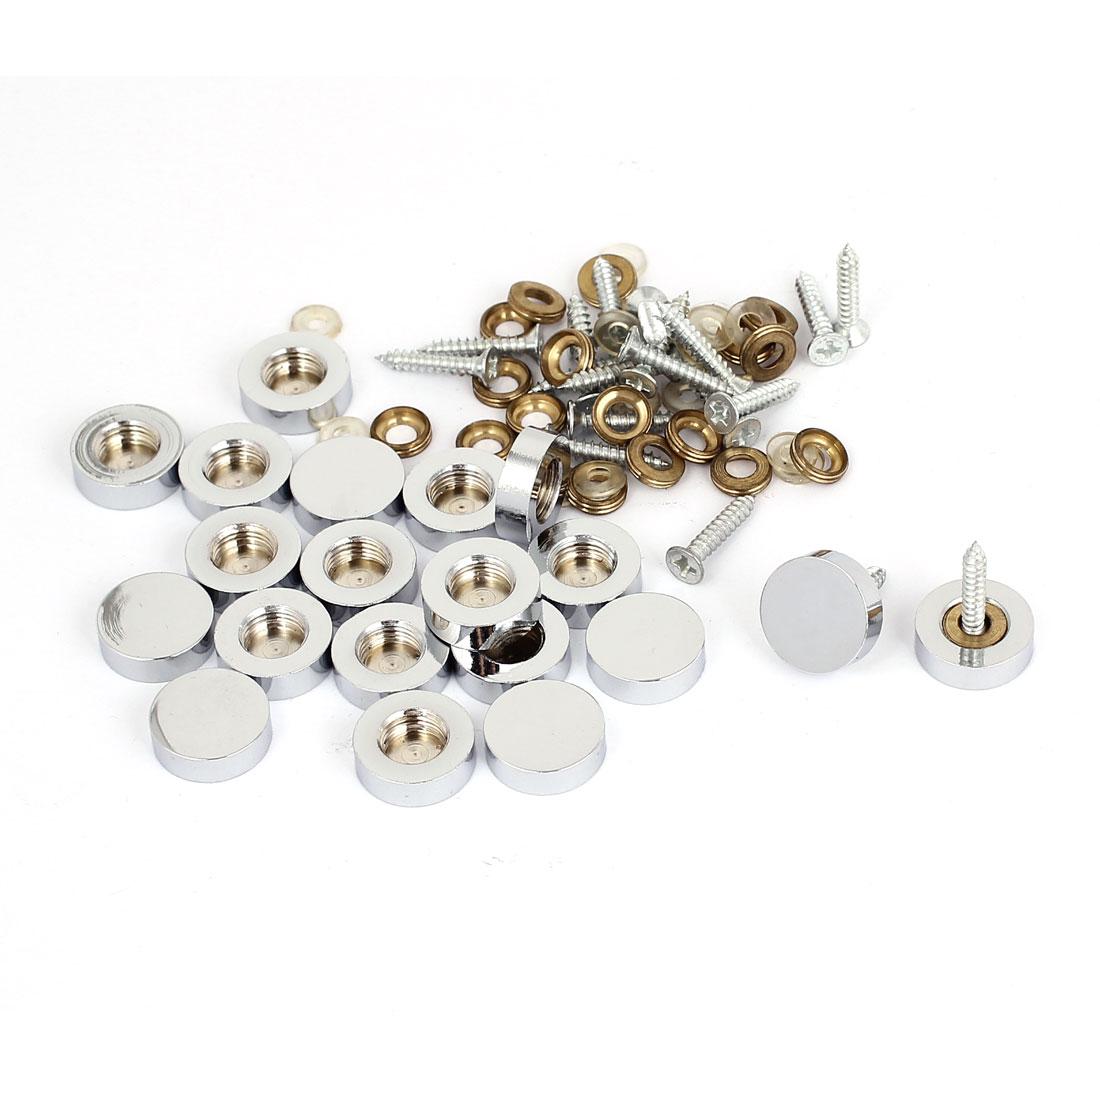 18mm Dia Advertising Glass Tea Table Decorative Metal Mirror Screw Nails 20Pcs